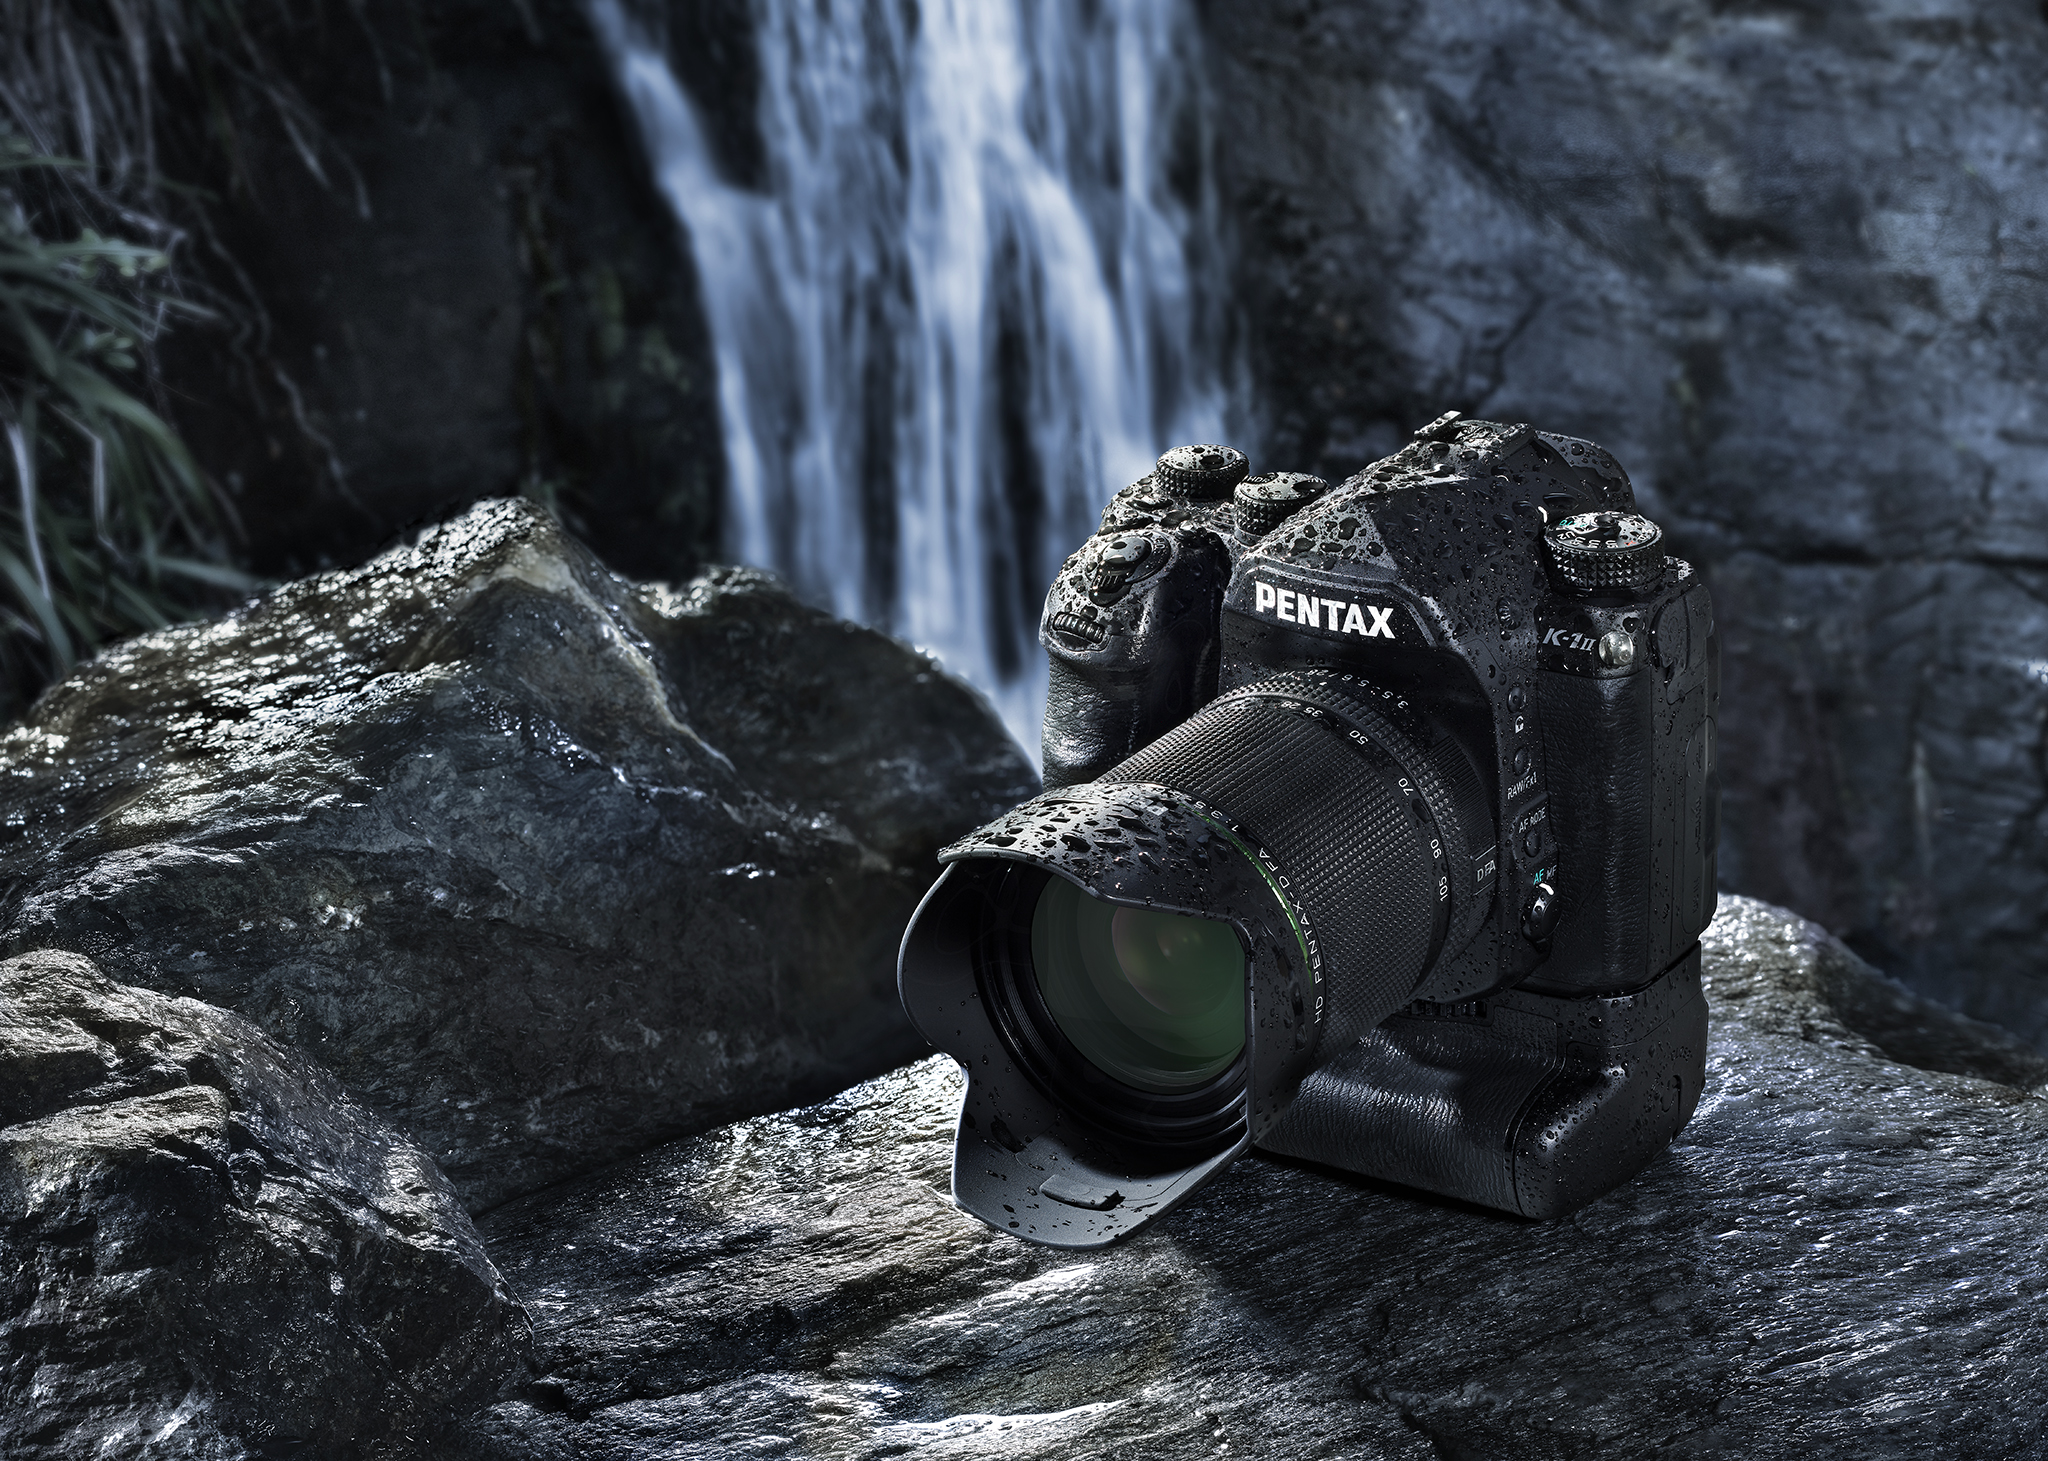 The best Pentax cameras in 2019